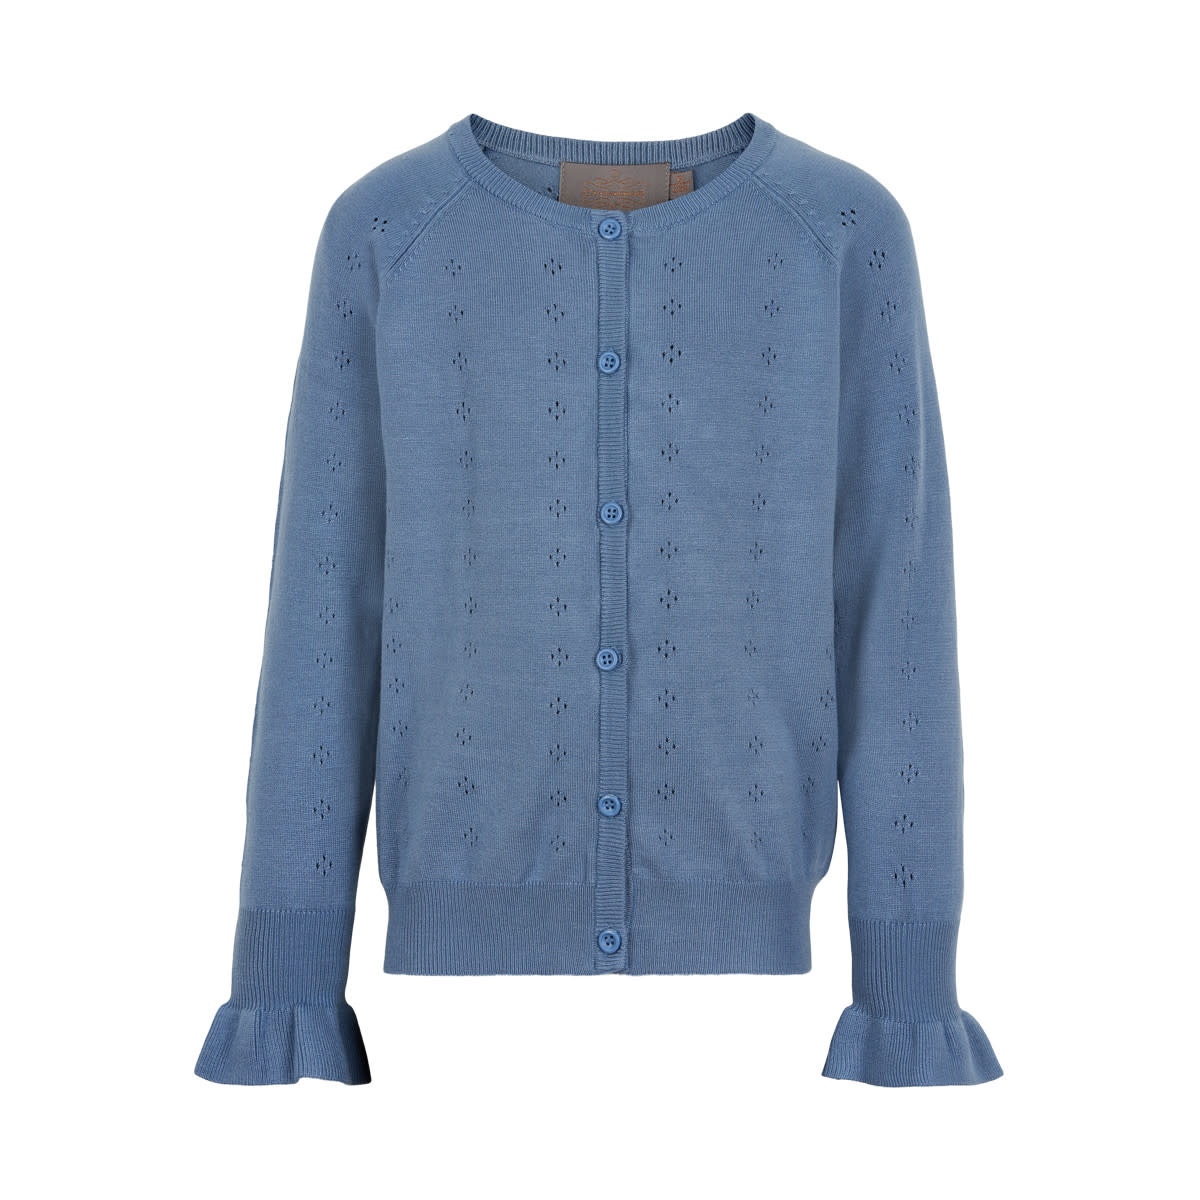 Pointelle Knit Cardigan - Infinity Blue